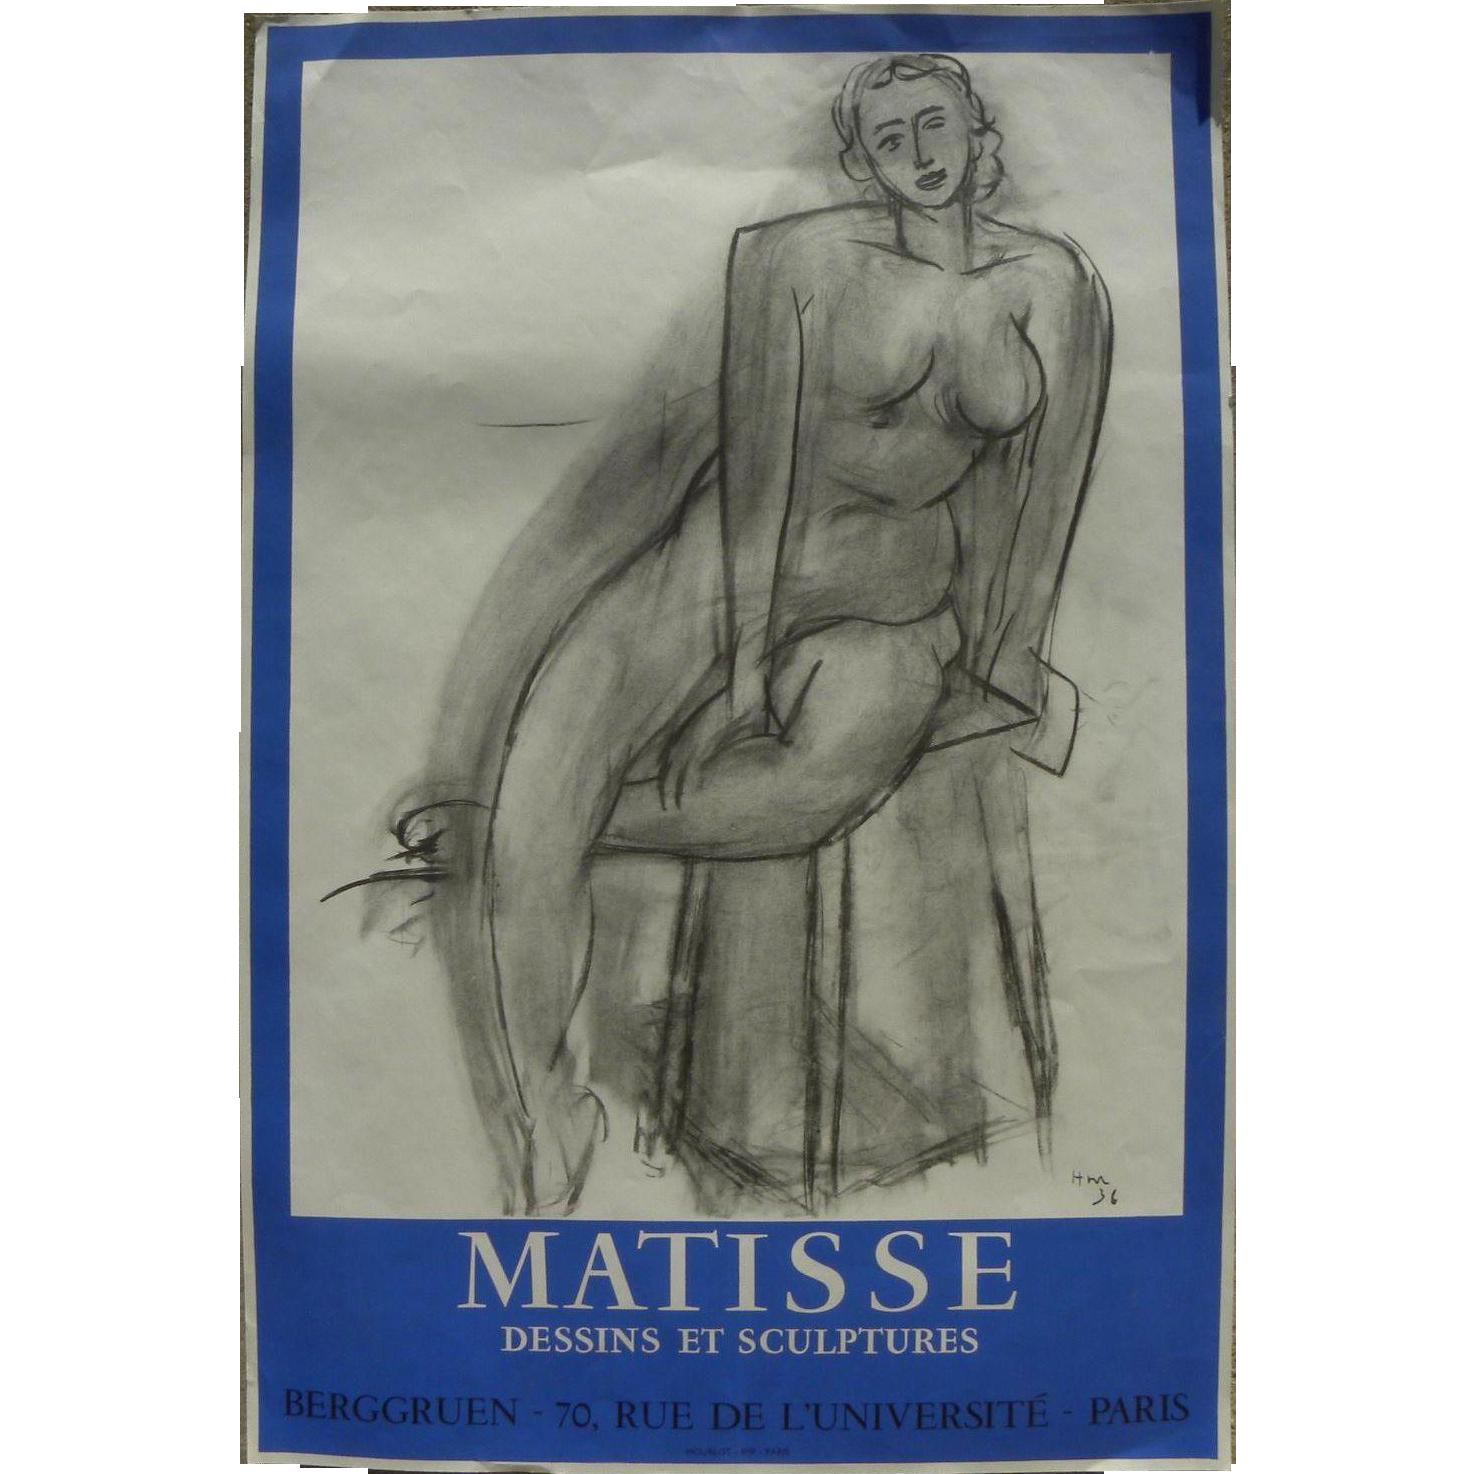 jpg royalty free library Henri original lithograph poster. Drawing prints matisse